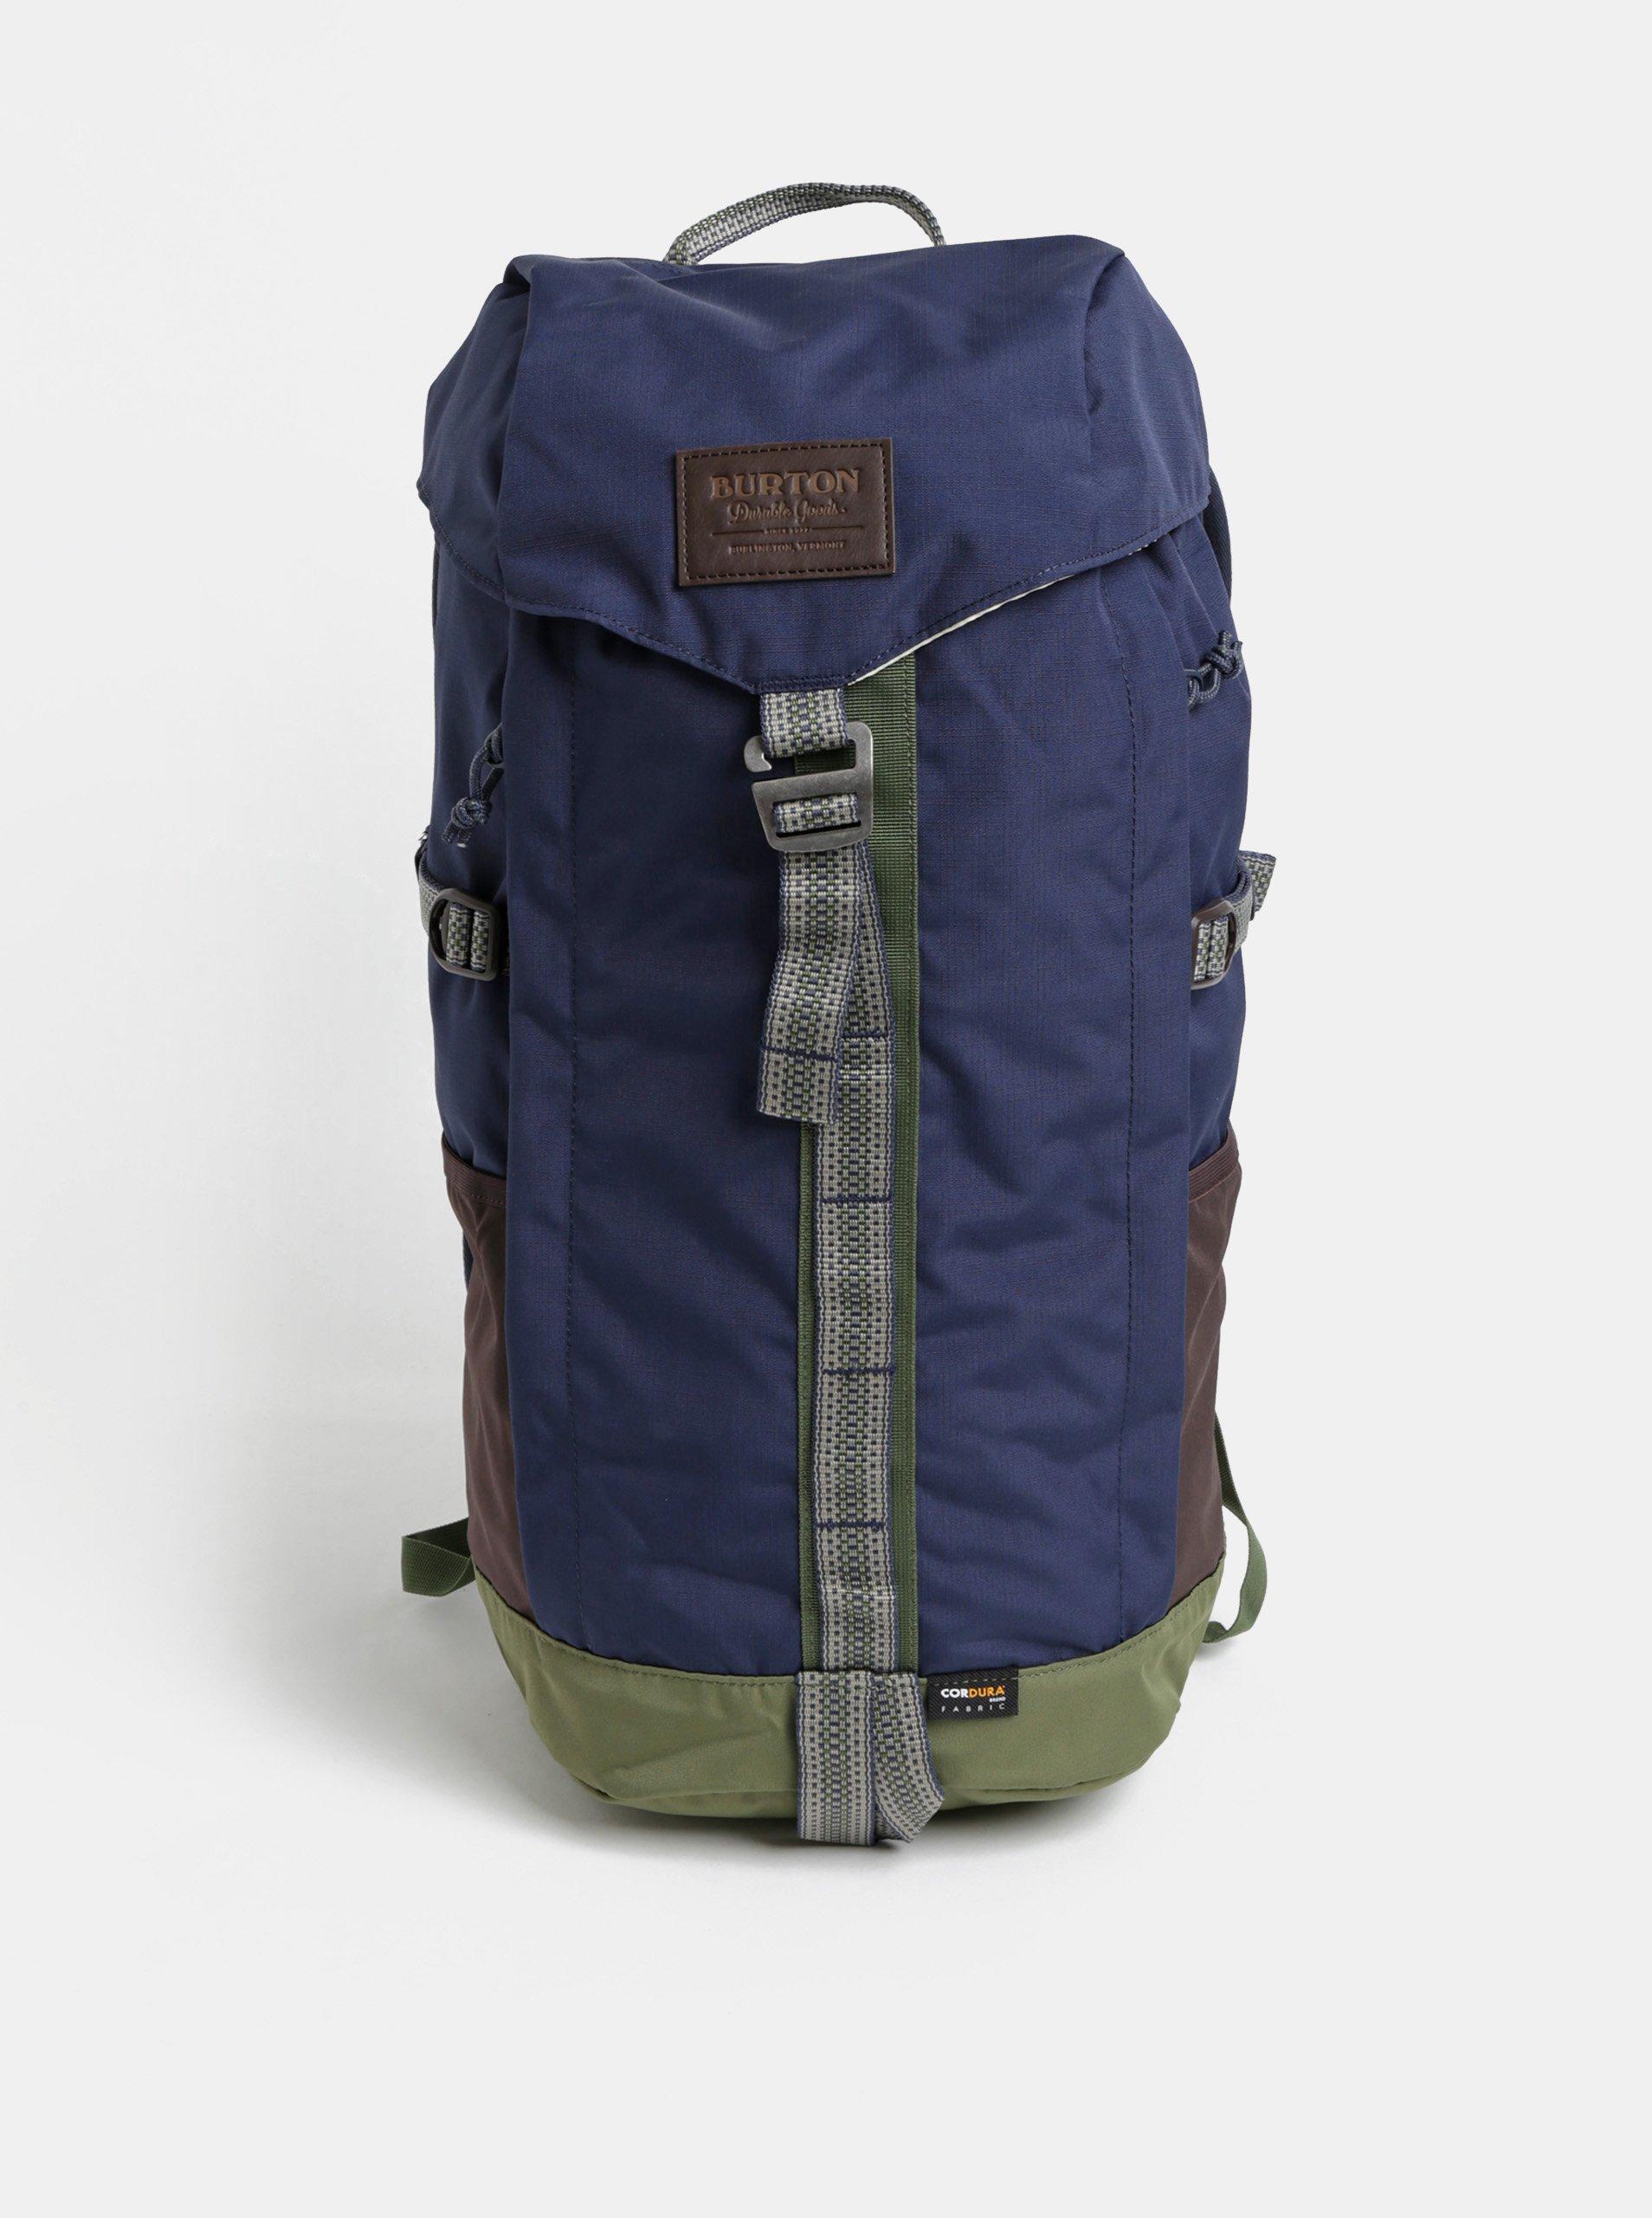 Skladaci batoh s bocni kapsou modra  d9a778fcfb